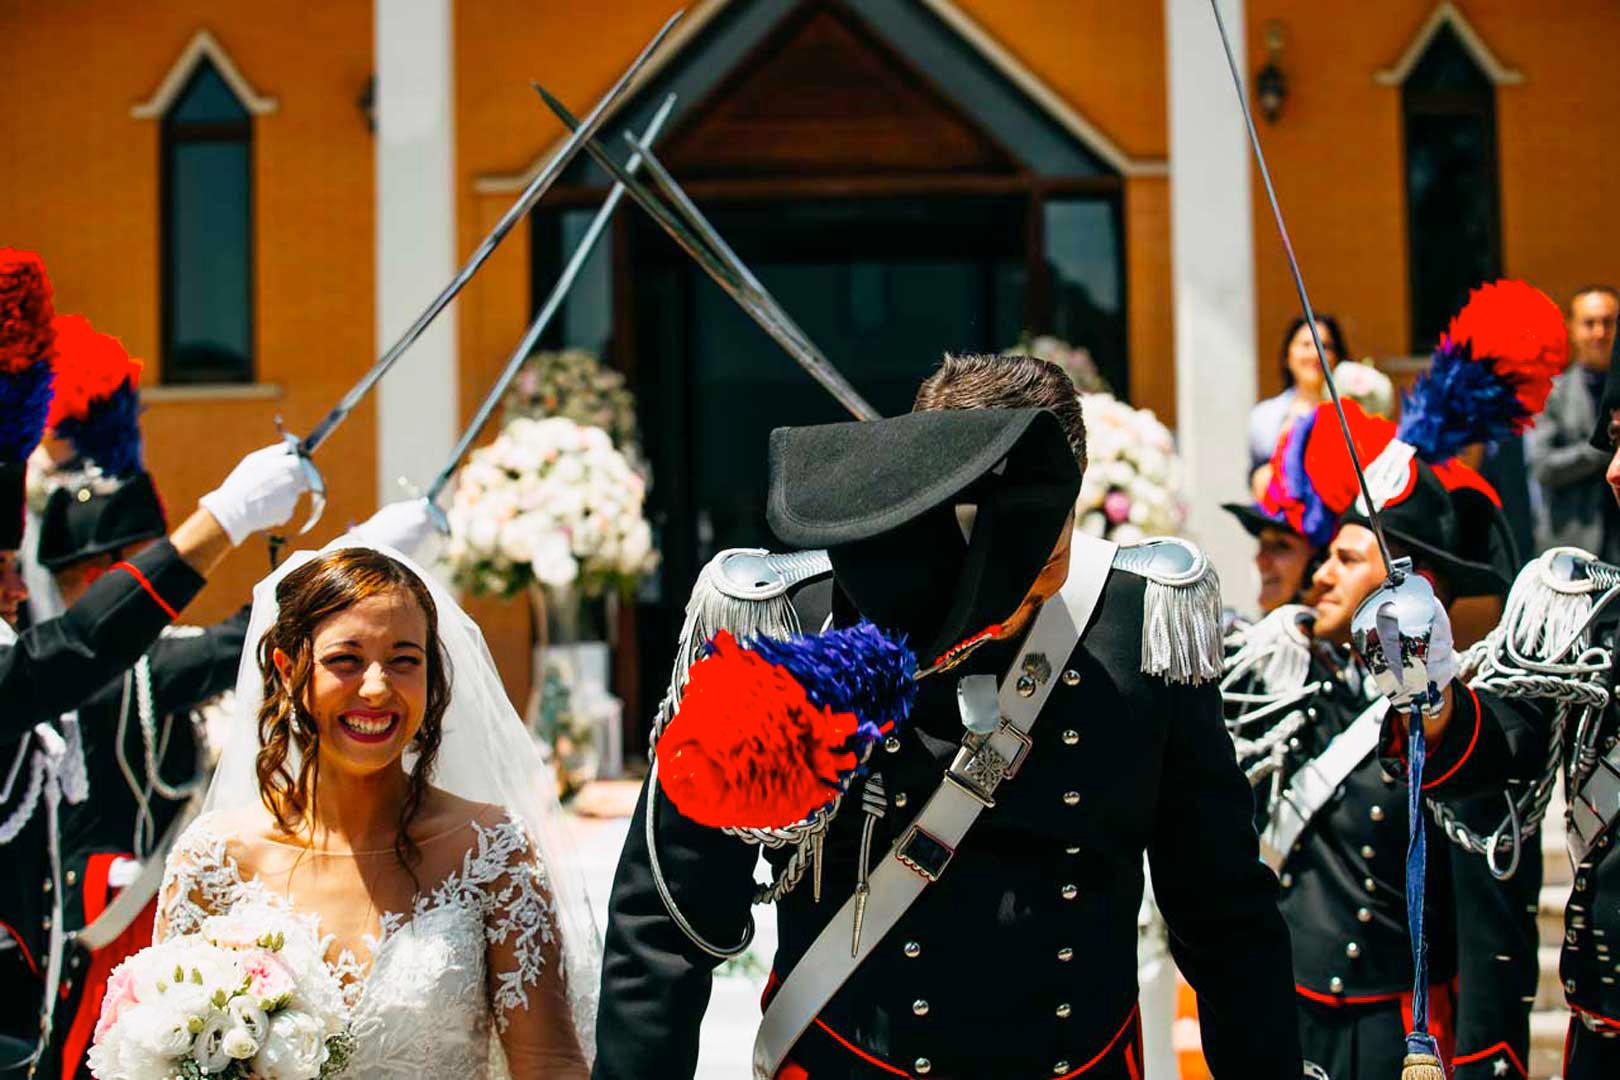 023-matrimonio-carabiniere-gianni-lepore